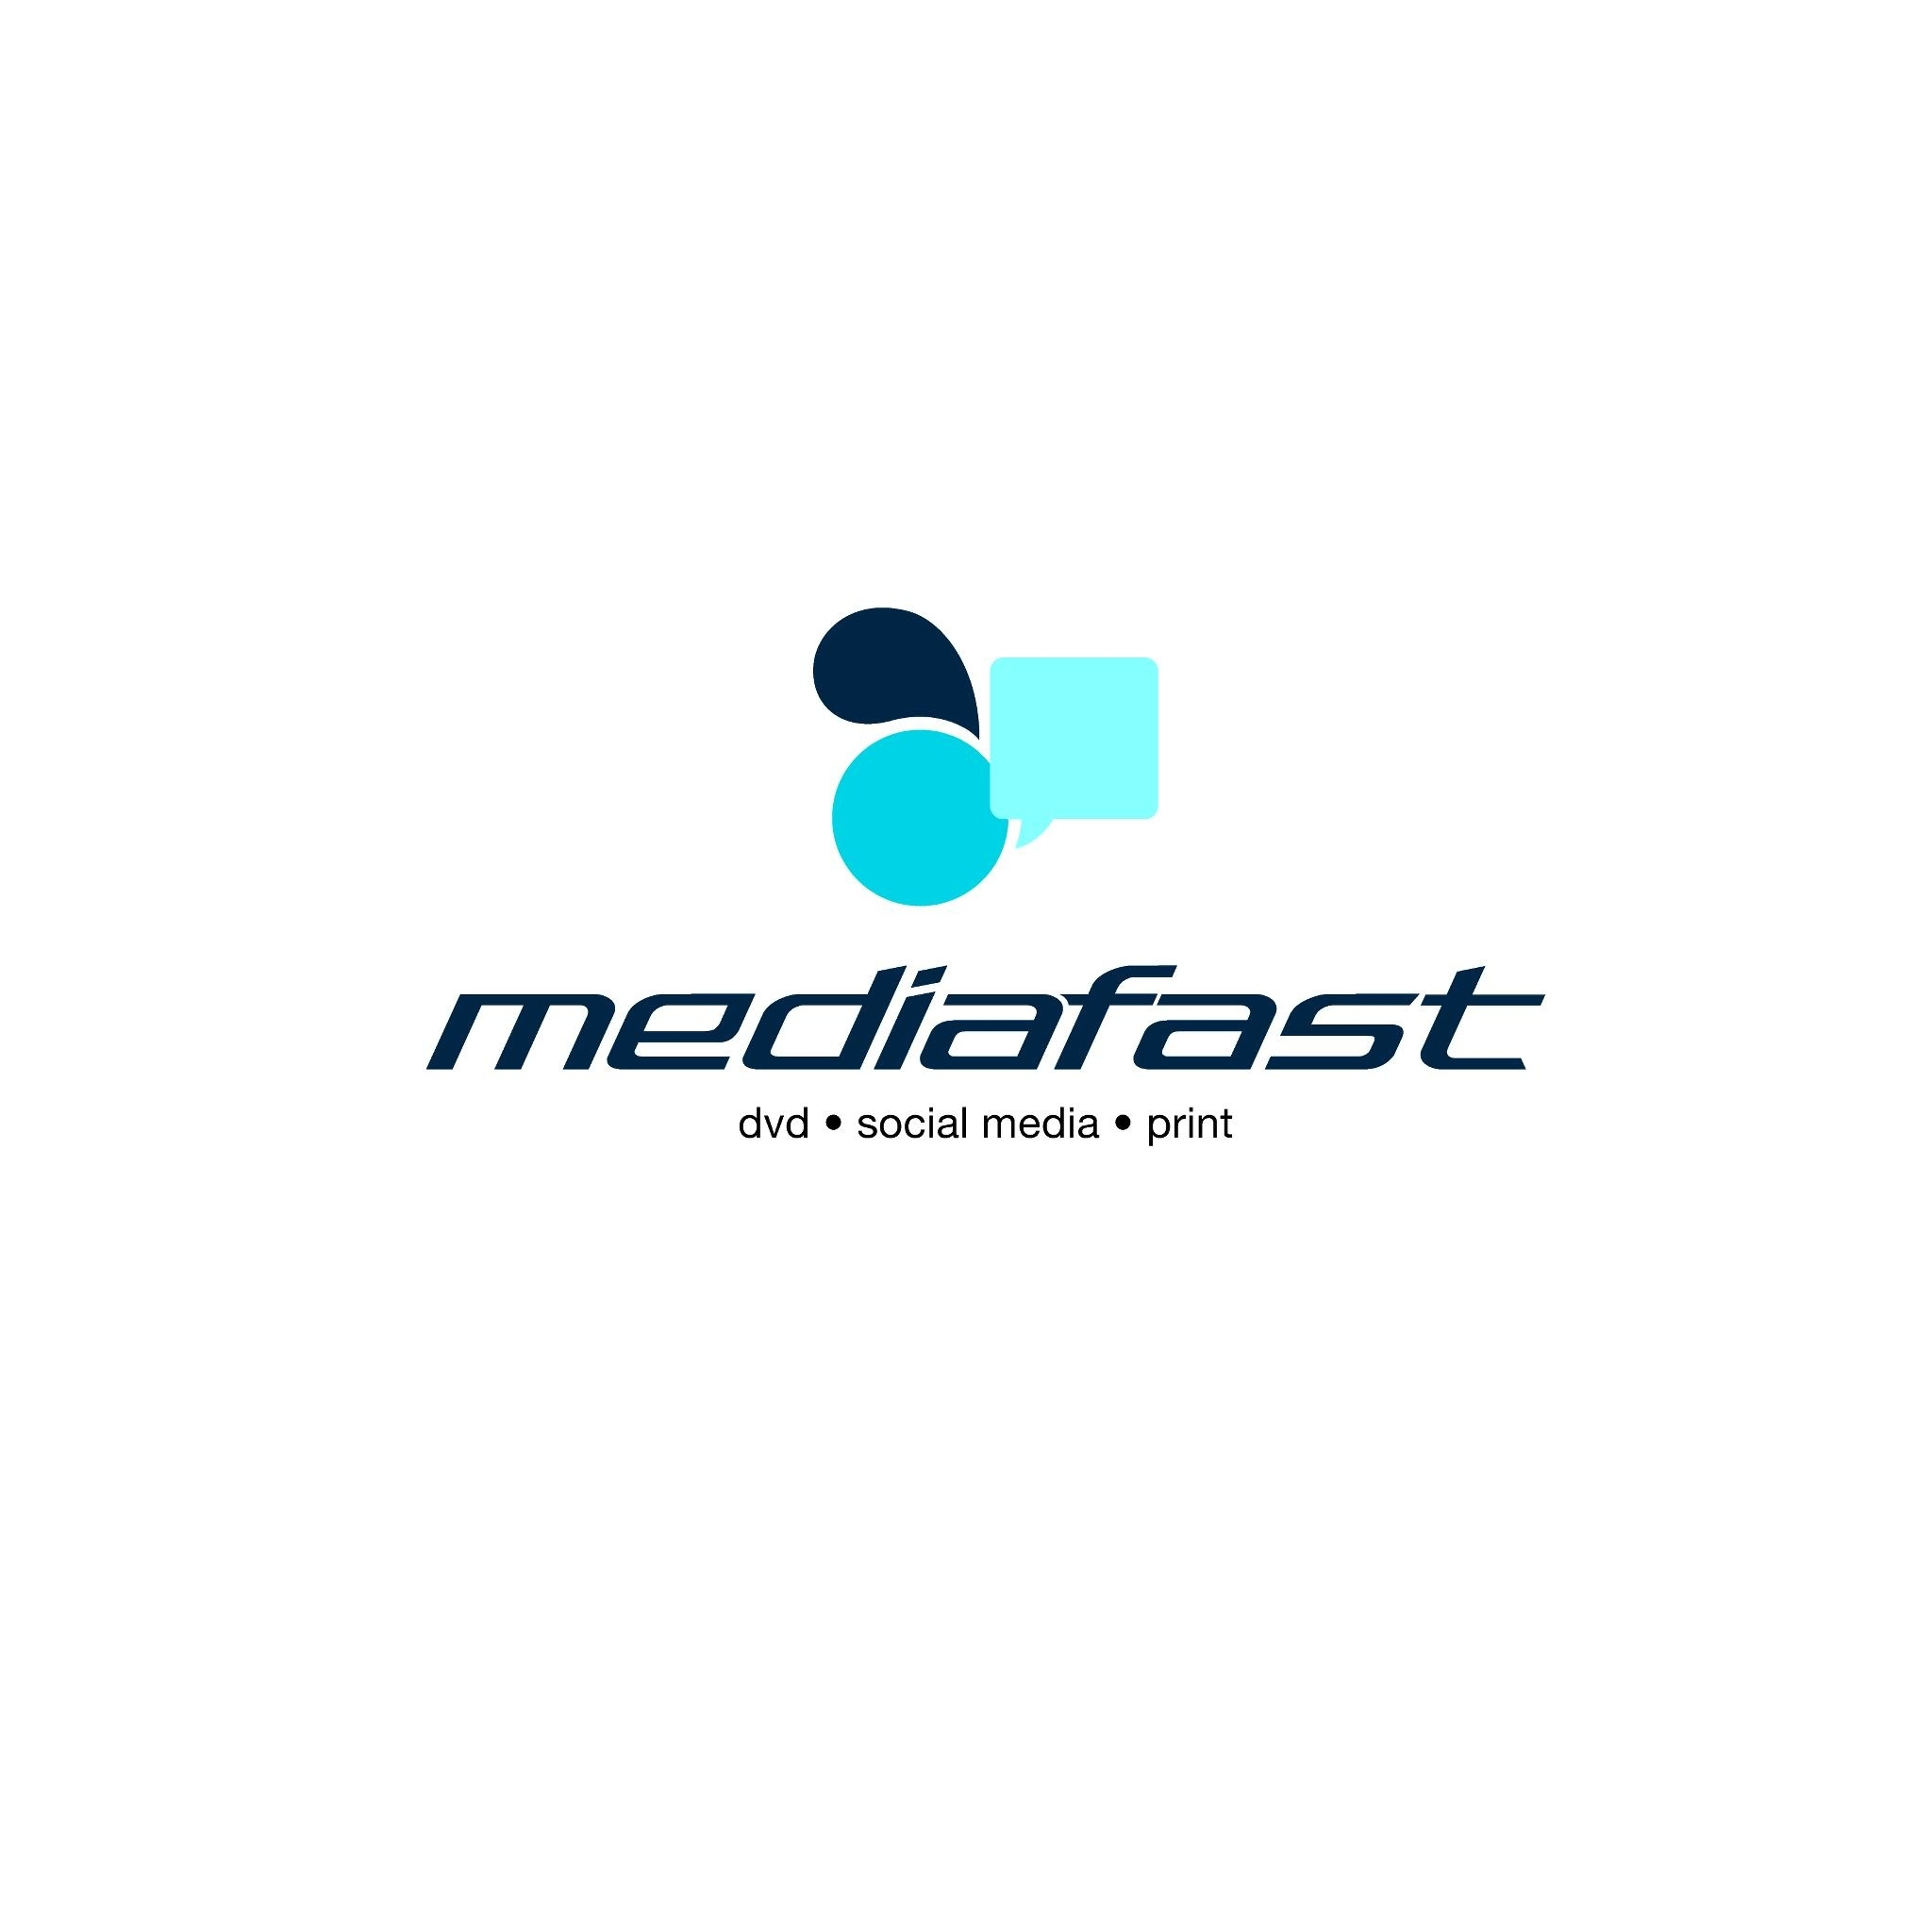 MediaFast